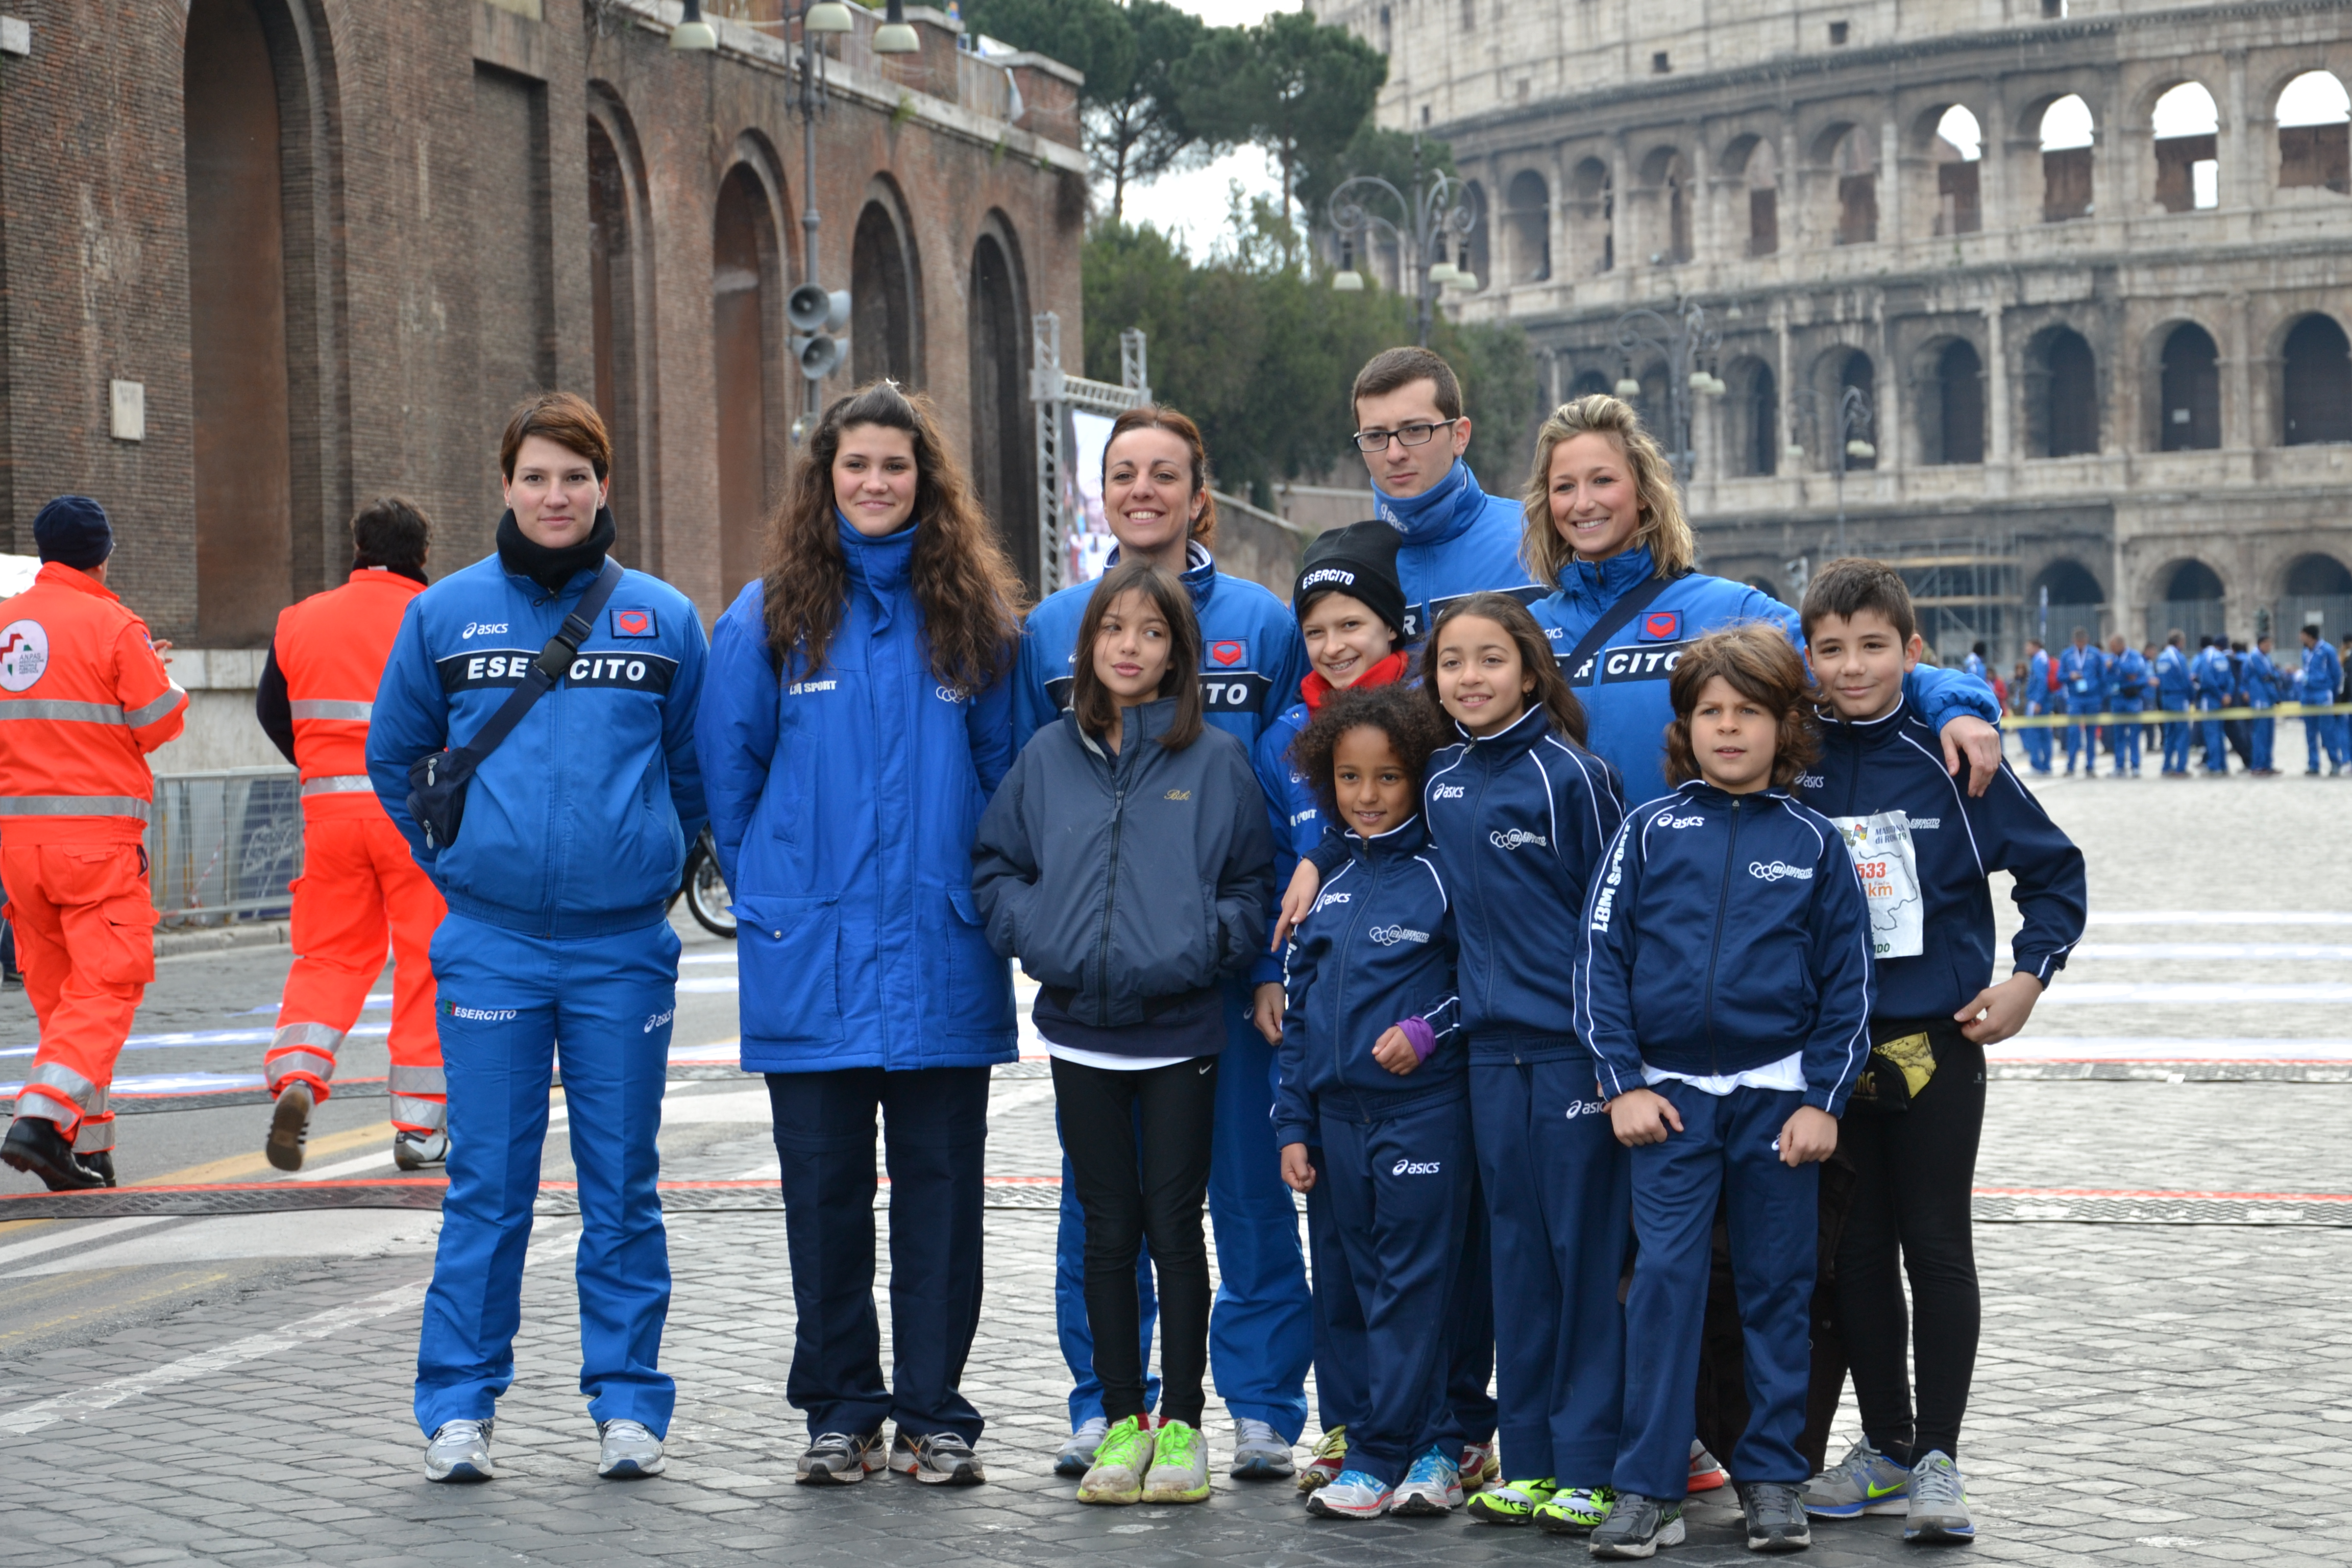 maratona-di-roma-2013-050